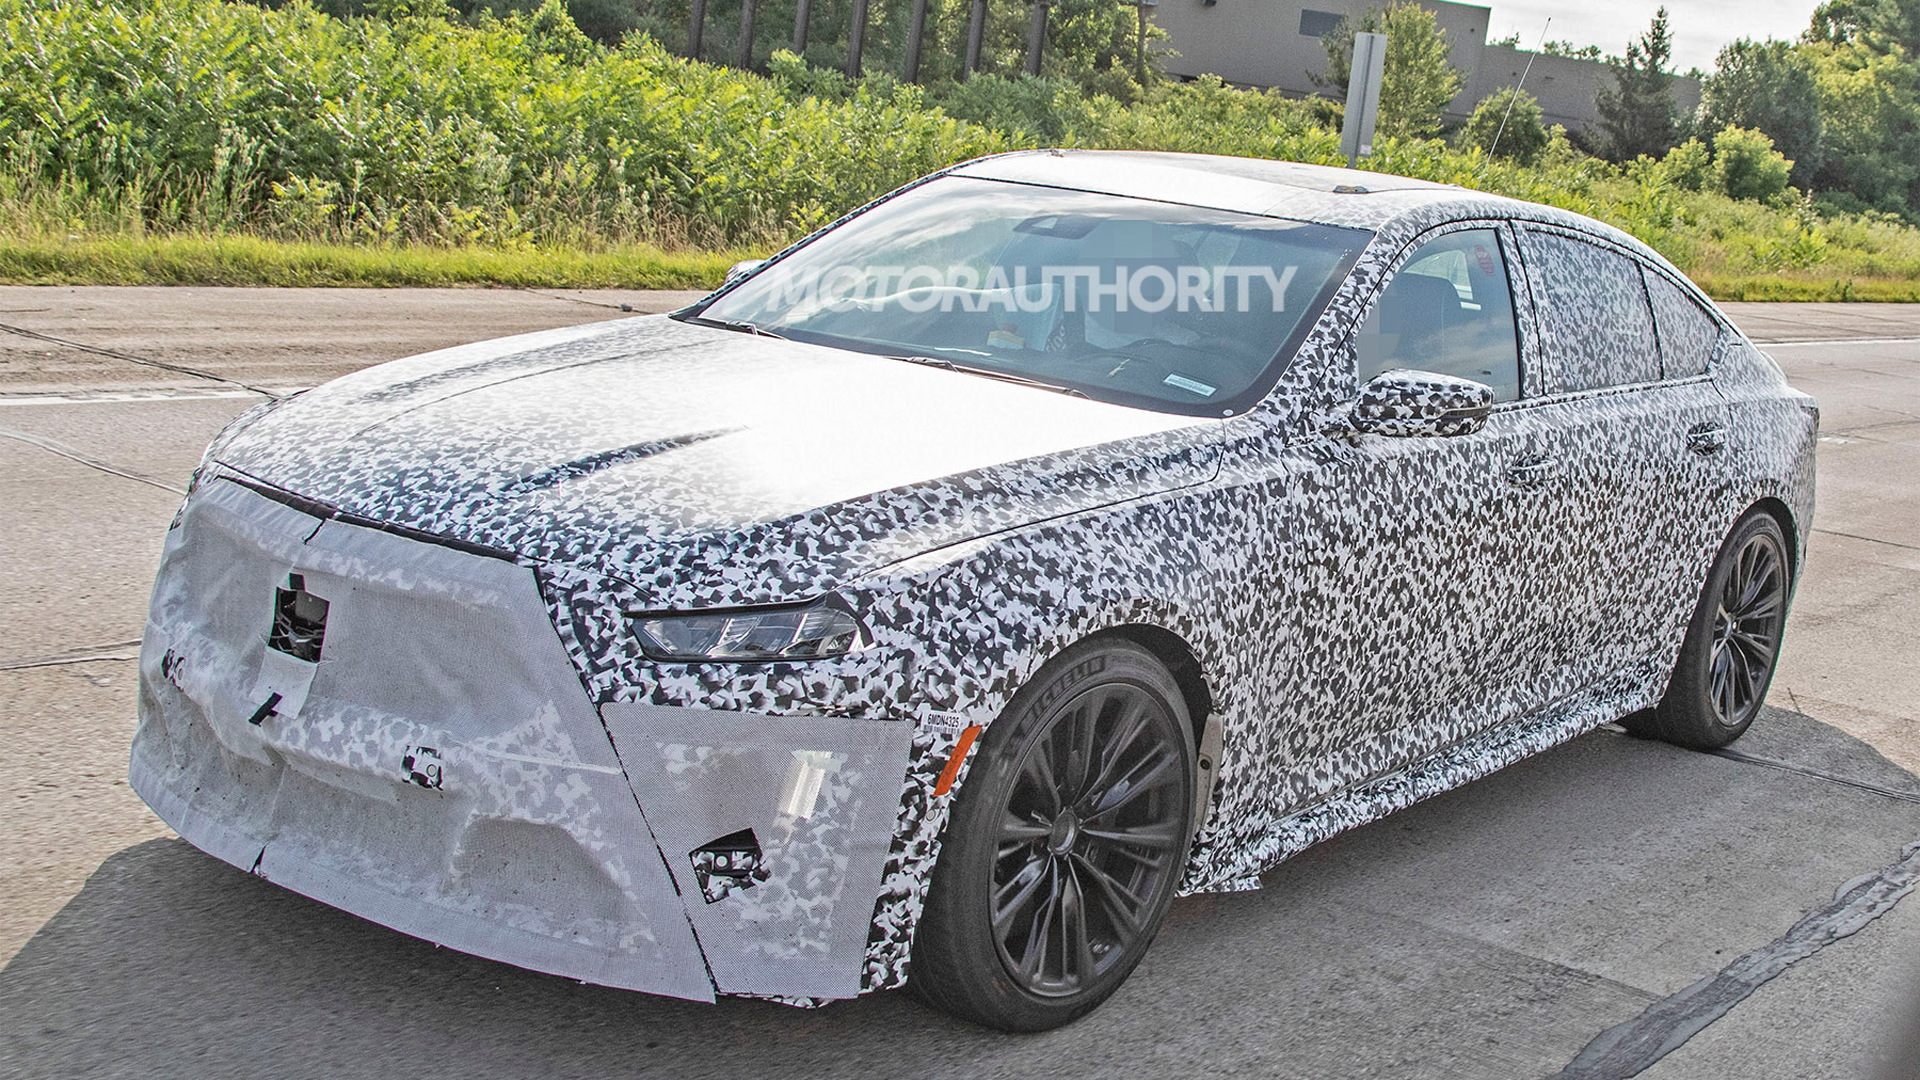 2020 Cadillac CT5-V Blackwing spy shots - Image via S. Baldauf/SB-Medien